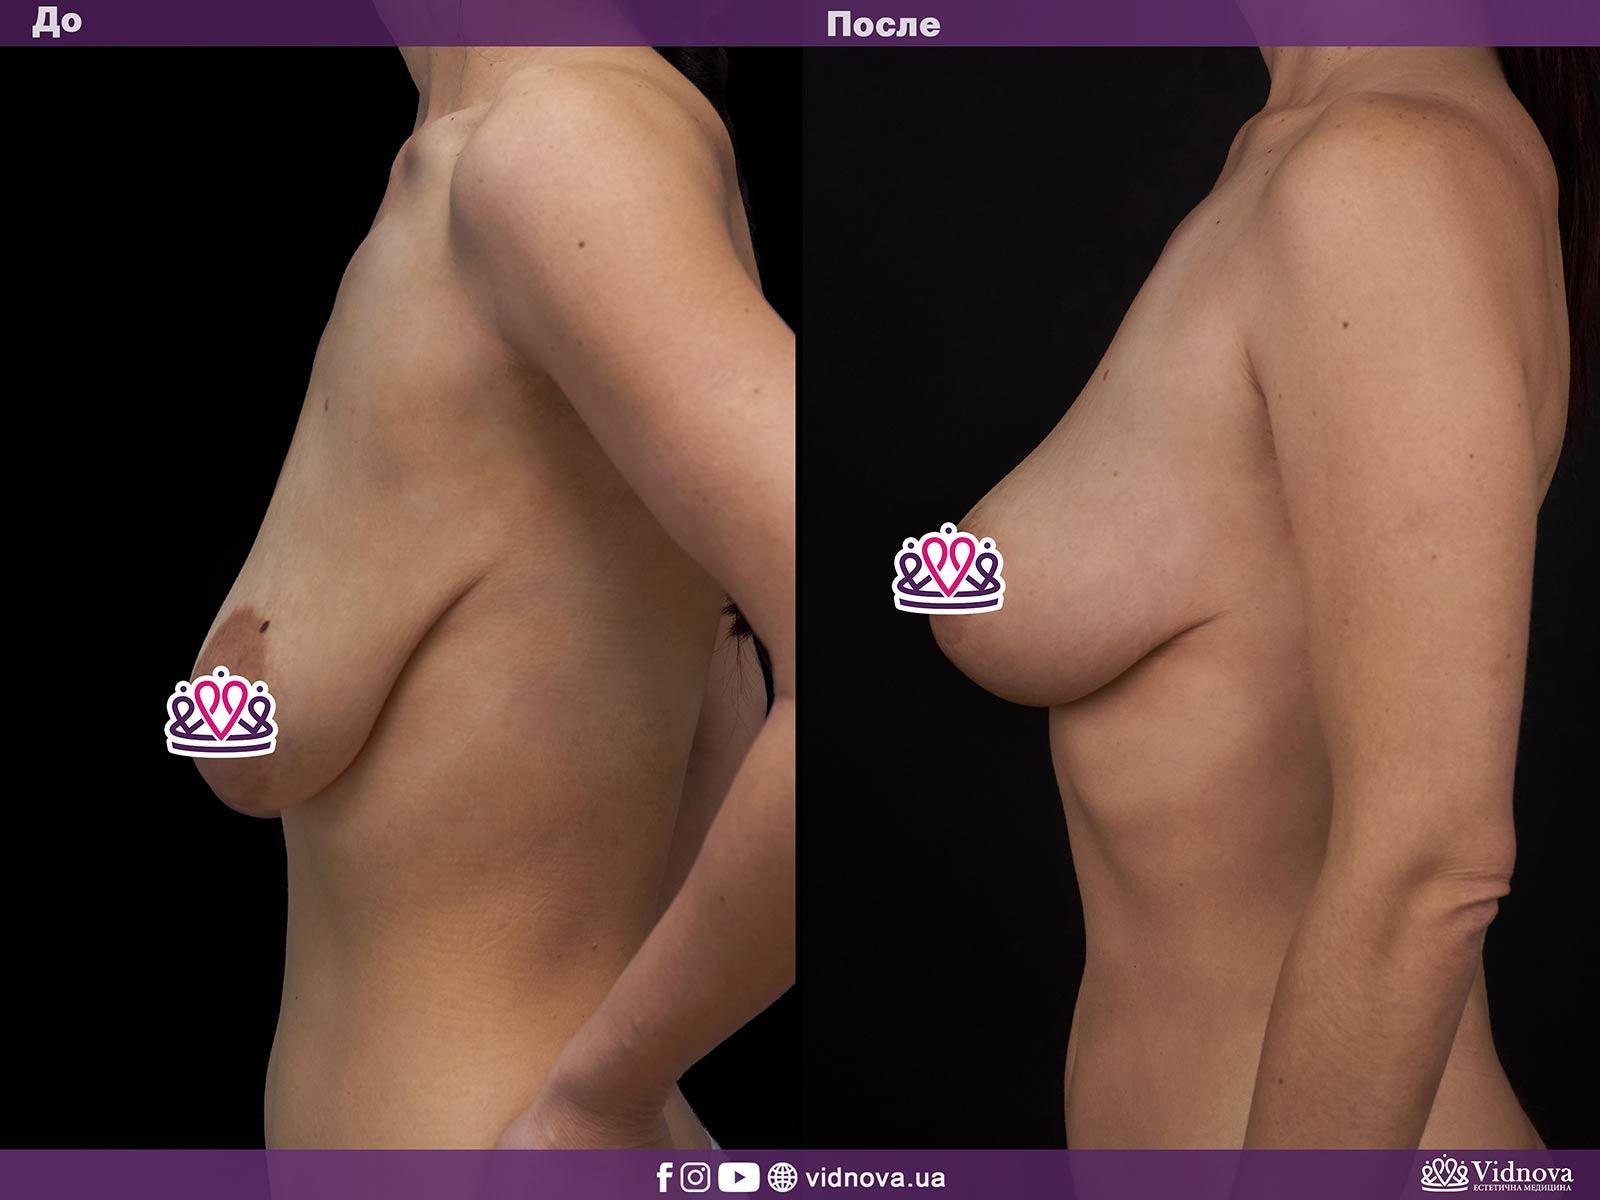 Подтяжка груди: Фото ДО и ПОСЛЕ - Пример №8-3 - Клиника Vidnova